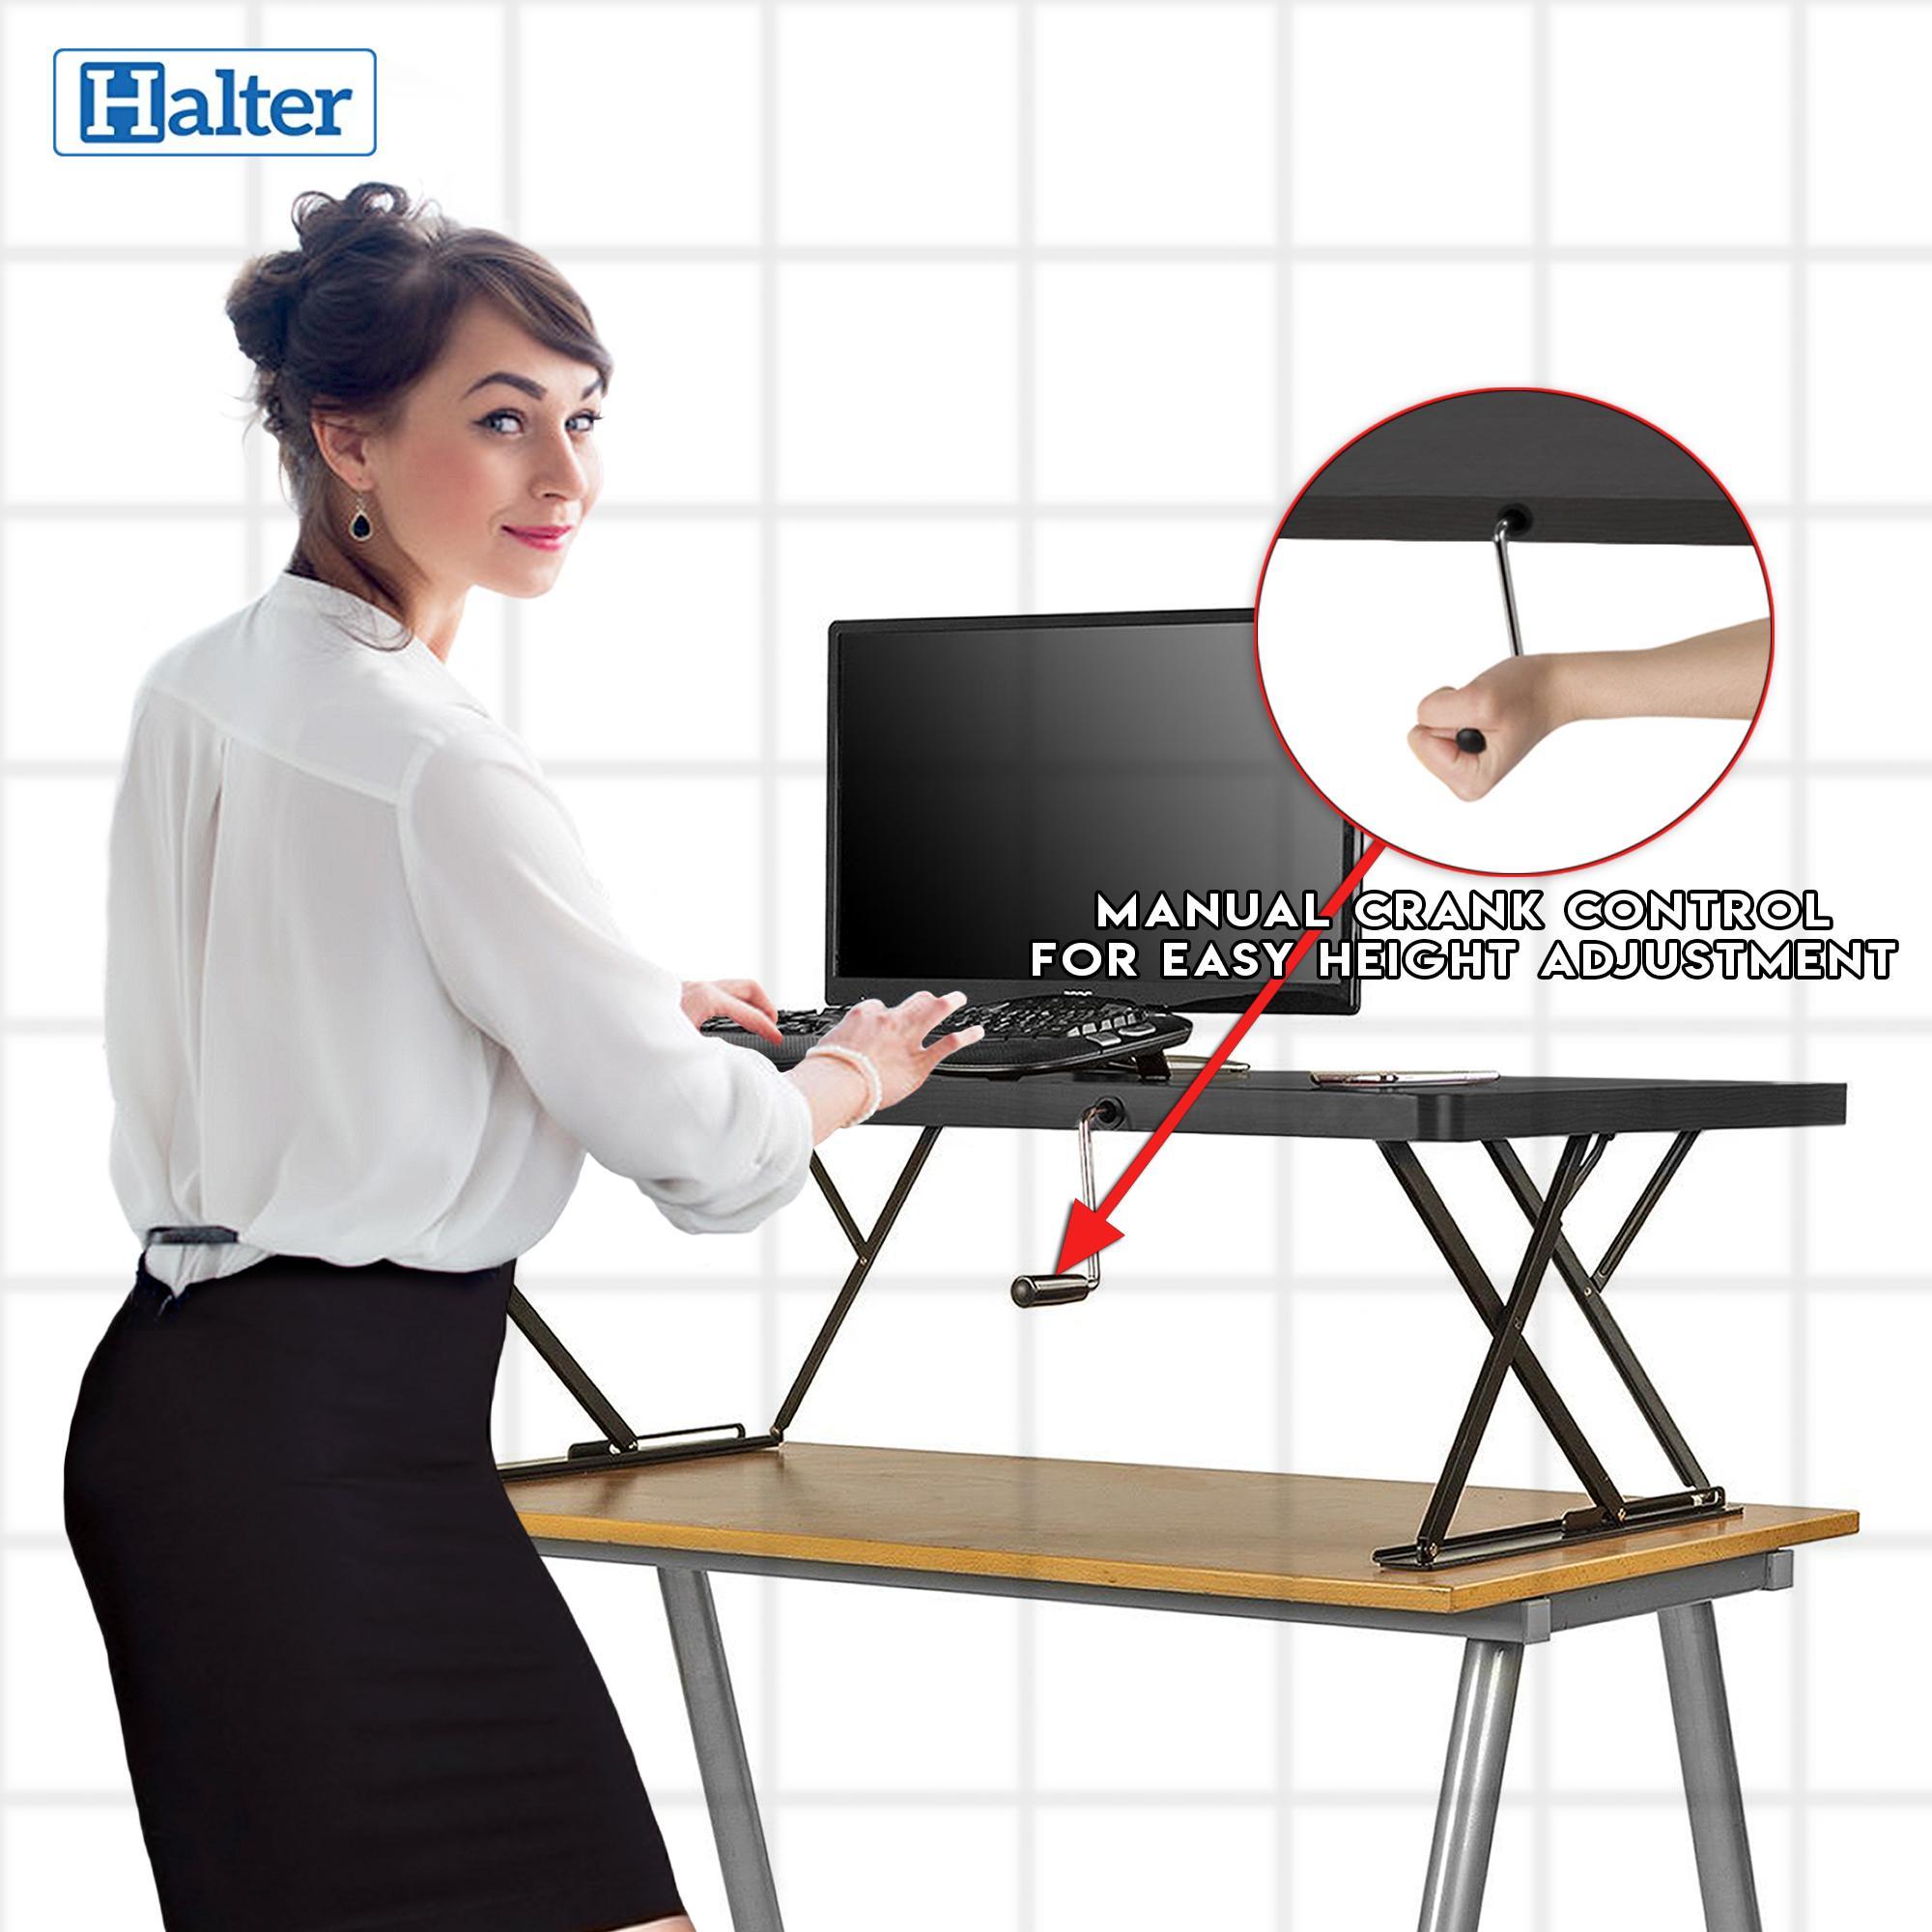 Amazon.com : Halter Manual Adjustable Height Table Top Sit ...